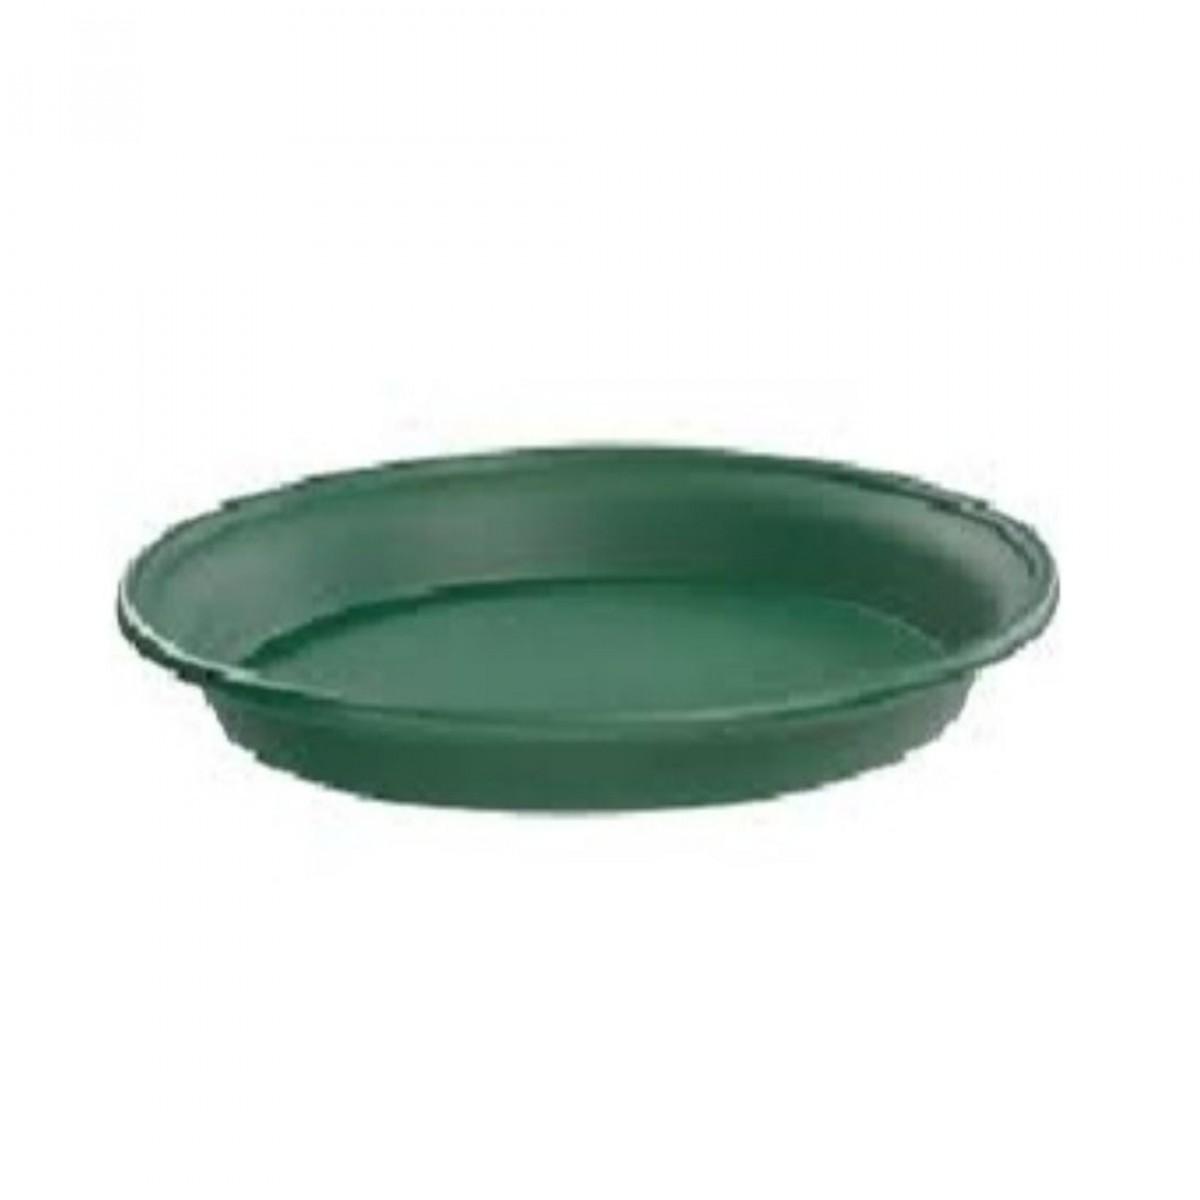 26CM Plastic Tray Green - 10 No